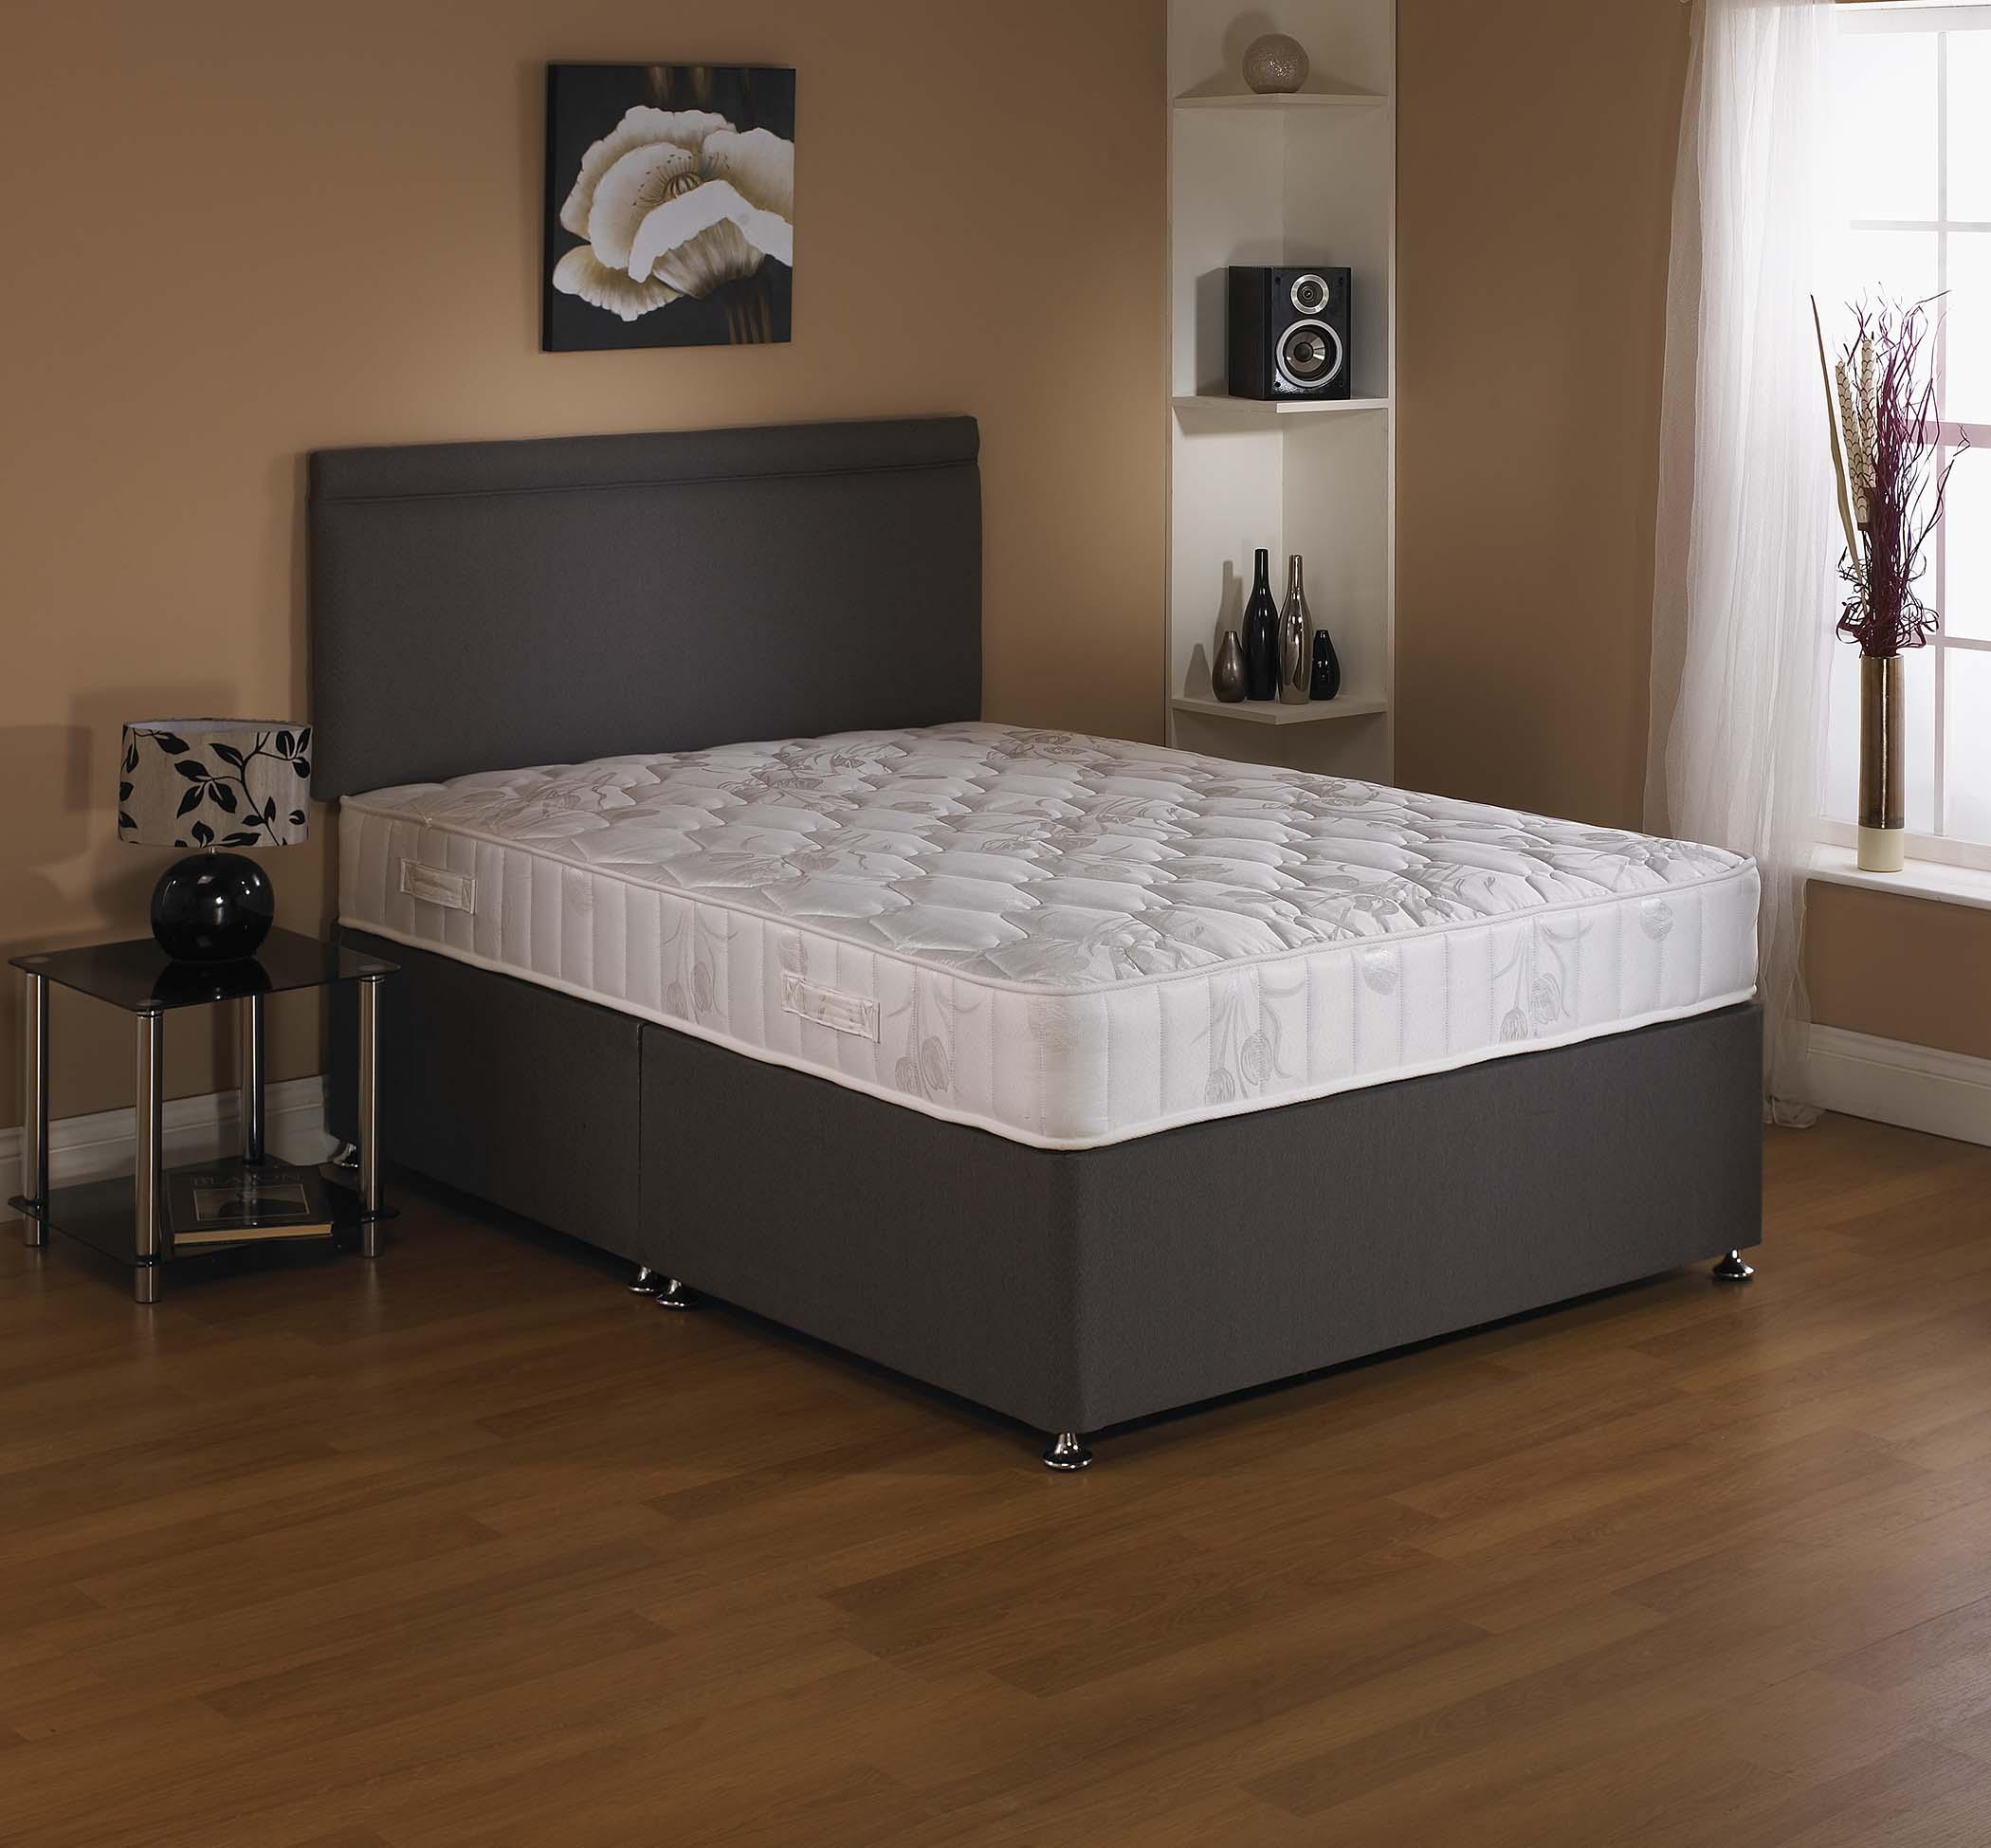 dream sofas wishaw sofa cushion material types divan beds